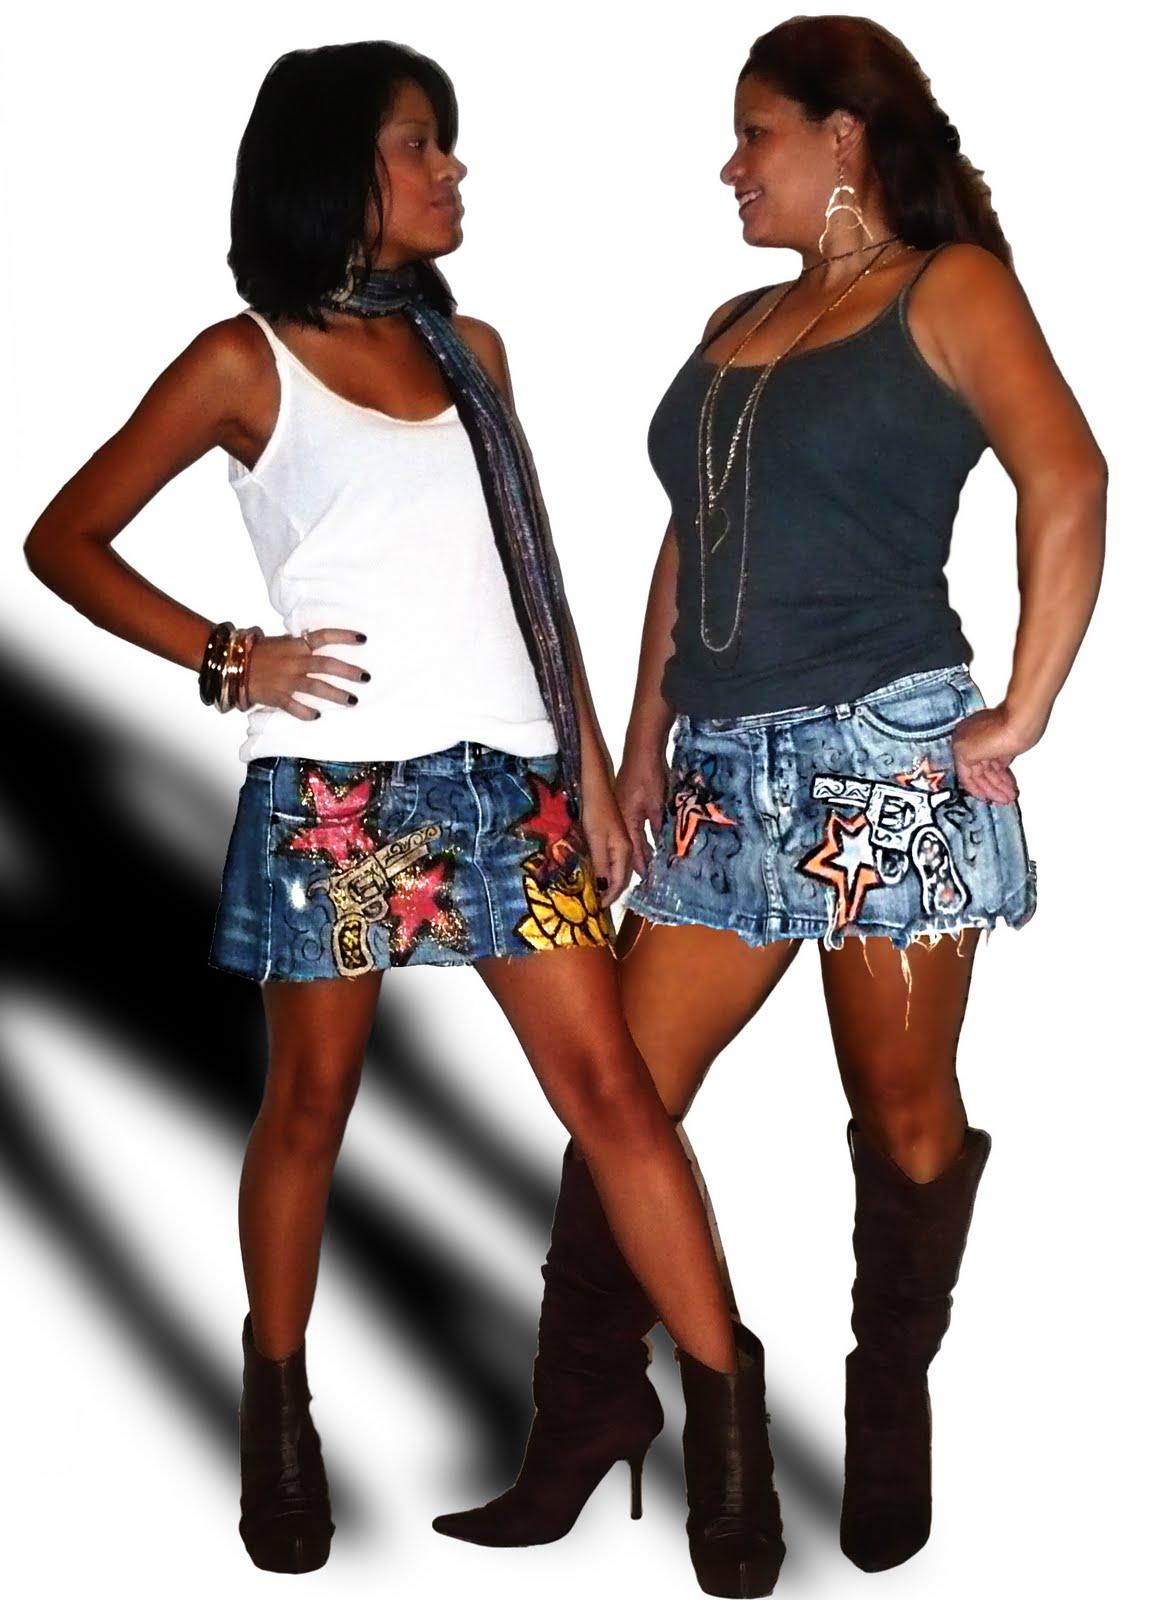 http://4.bp.blogspot.com/-DpXZYWEfSBc/TfT9OuD0DQI/AAAAAAAAALI/nvzPiGvt1fs/s1600/vintage-tattoo-painted-mini-skirts.jpg